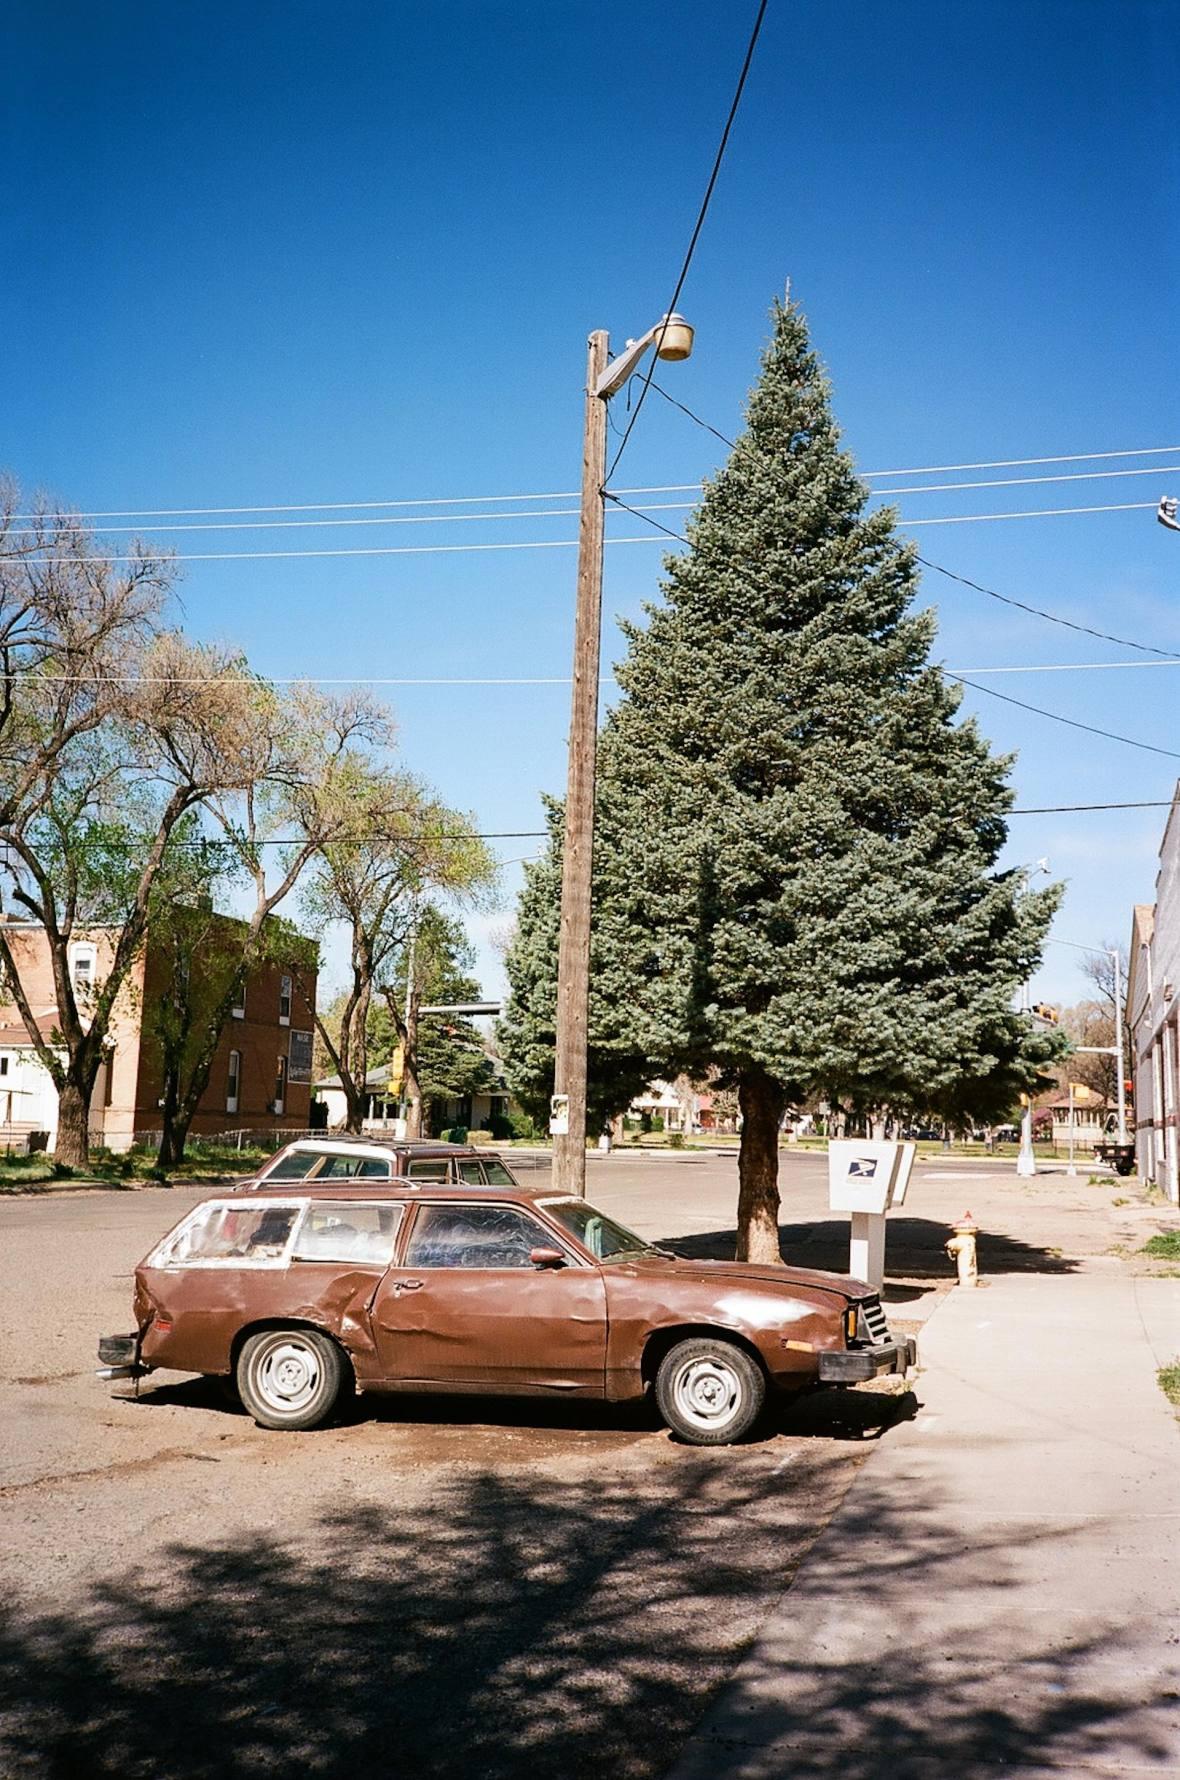 in Las Vegas, New Mexico 35mm Film Two Brown Stationwagons in Photography Nikon L35AF Kodak Ektar 100